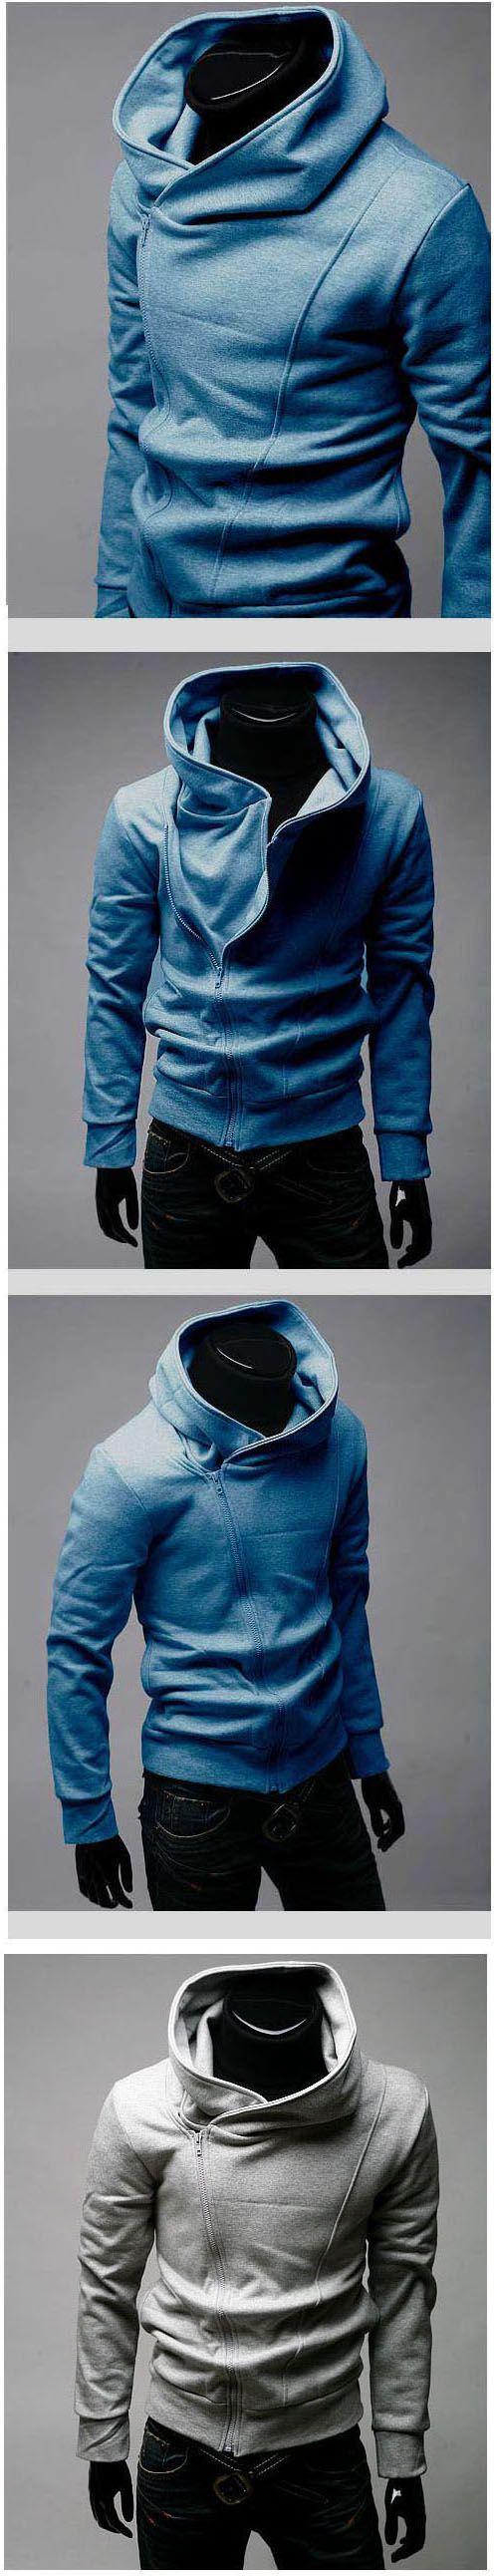 $17.61  #MensJacketsCoats Stylish Cotton Blends Solid Zipper Hooded Men Sweatshirt Discount Online Shopping